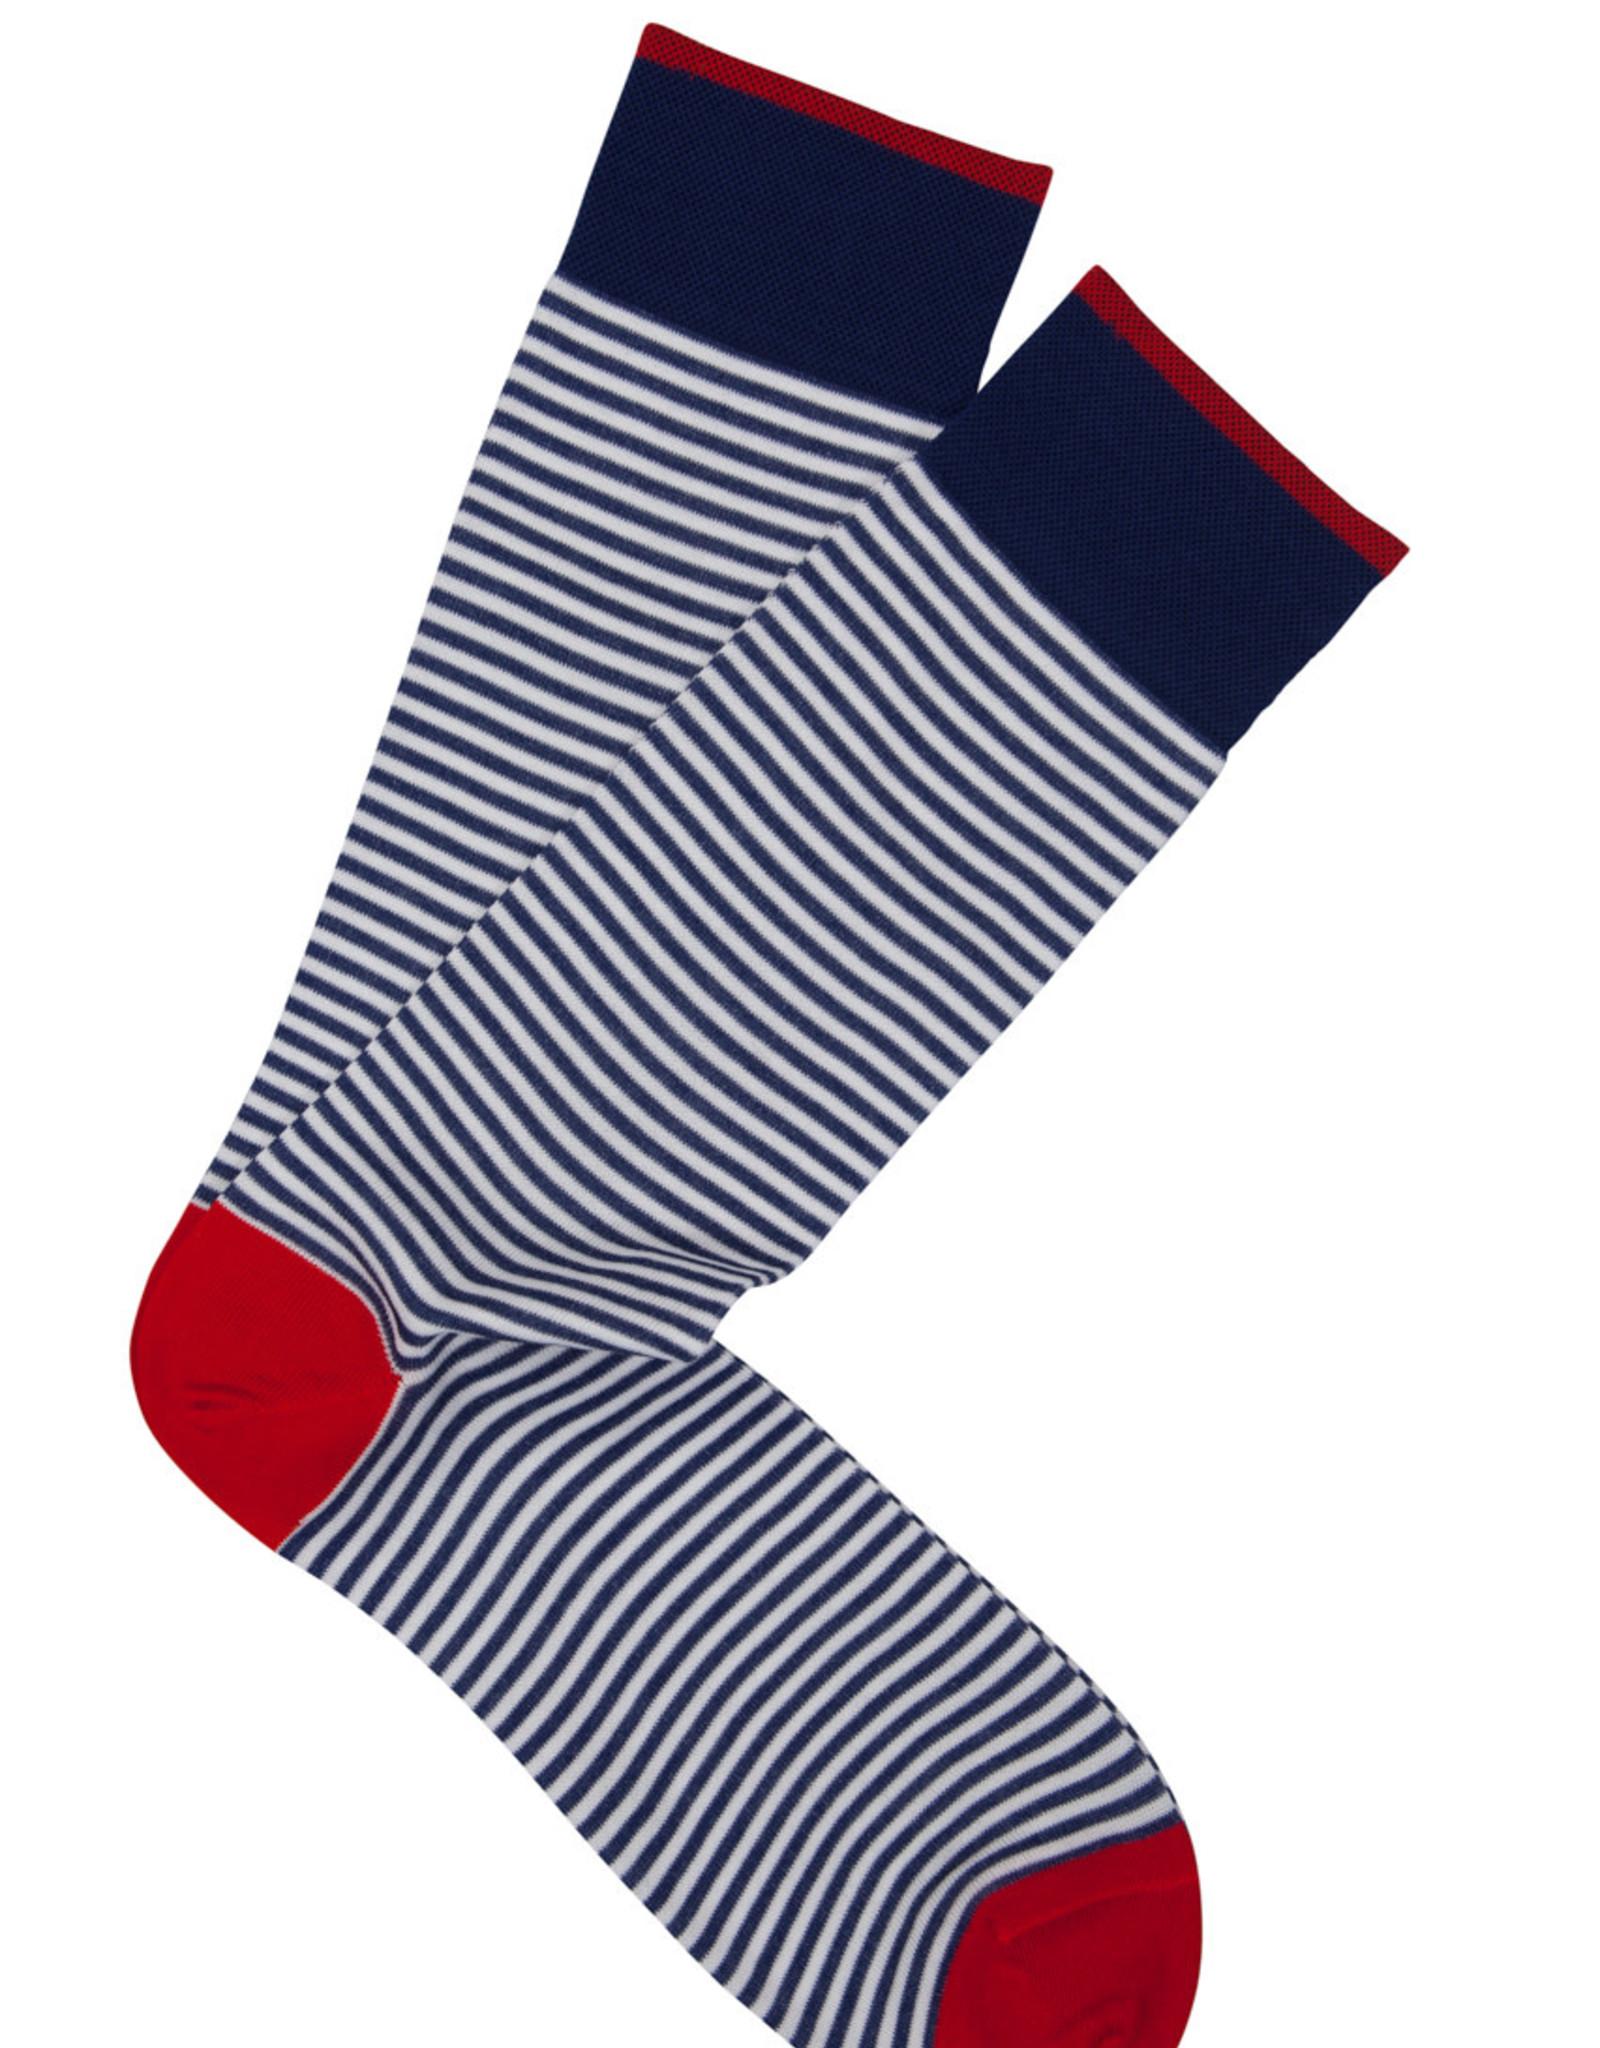 Marcoliani Marcoliani sokken blauw gestreept 3231T/008